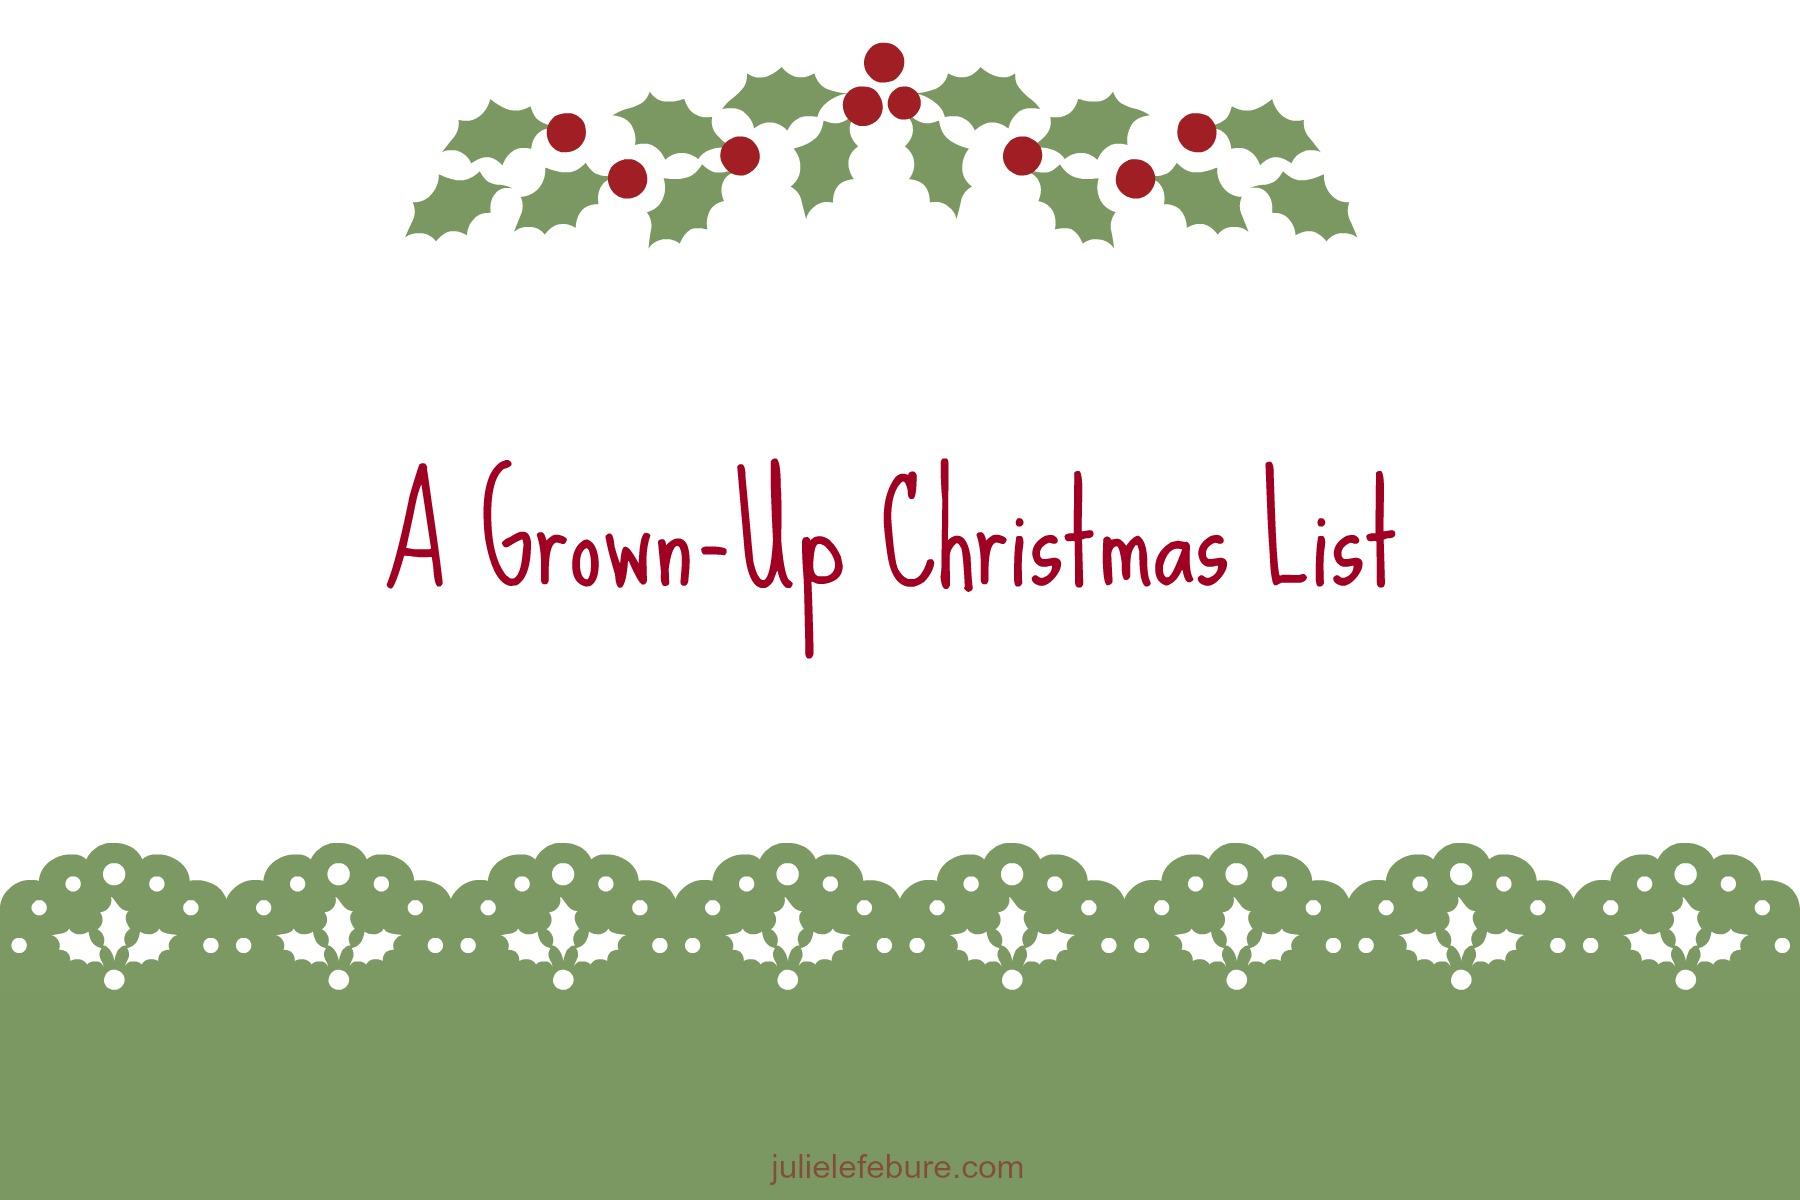 A Grown-Up Christmas List - Julie Lefebure